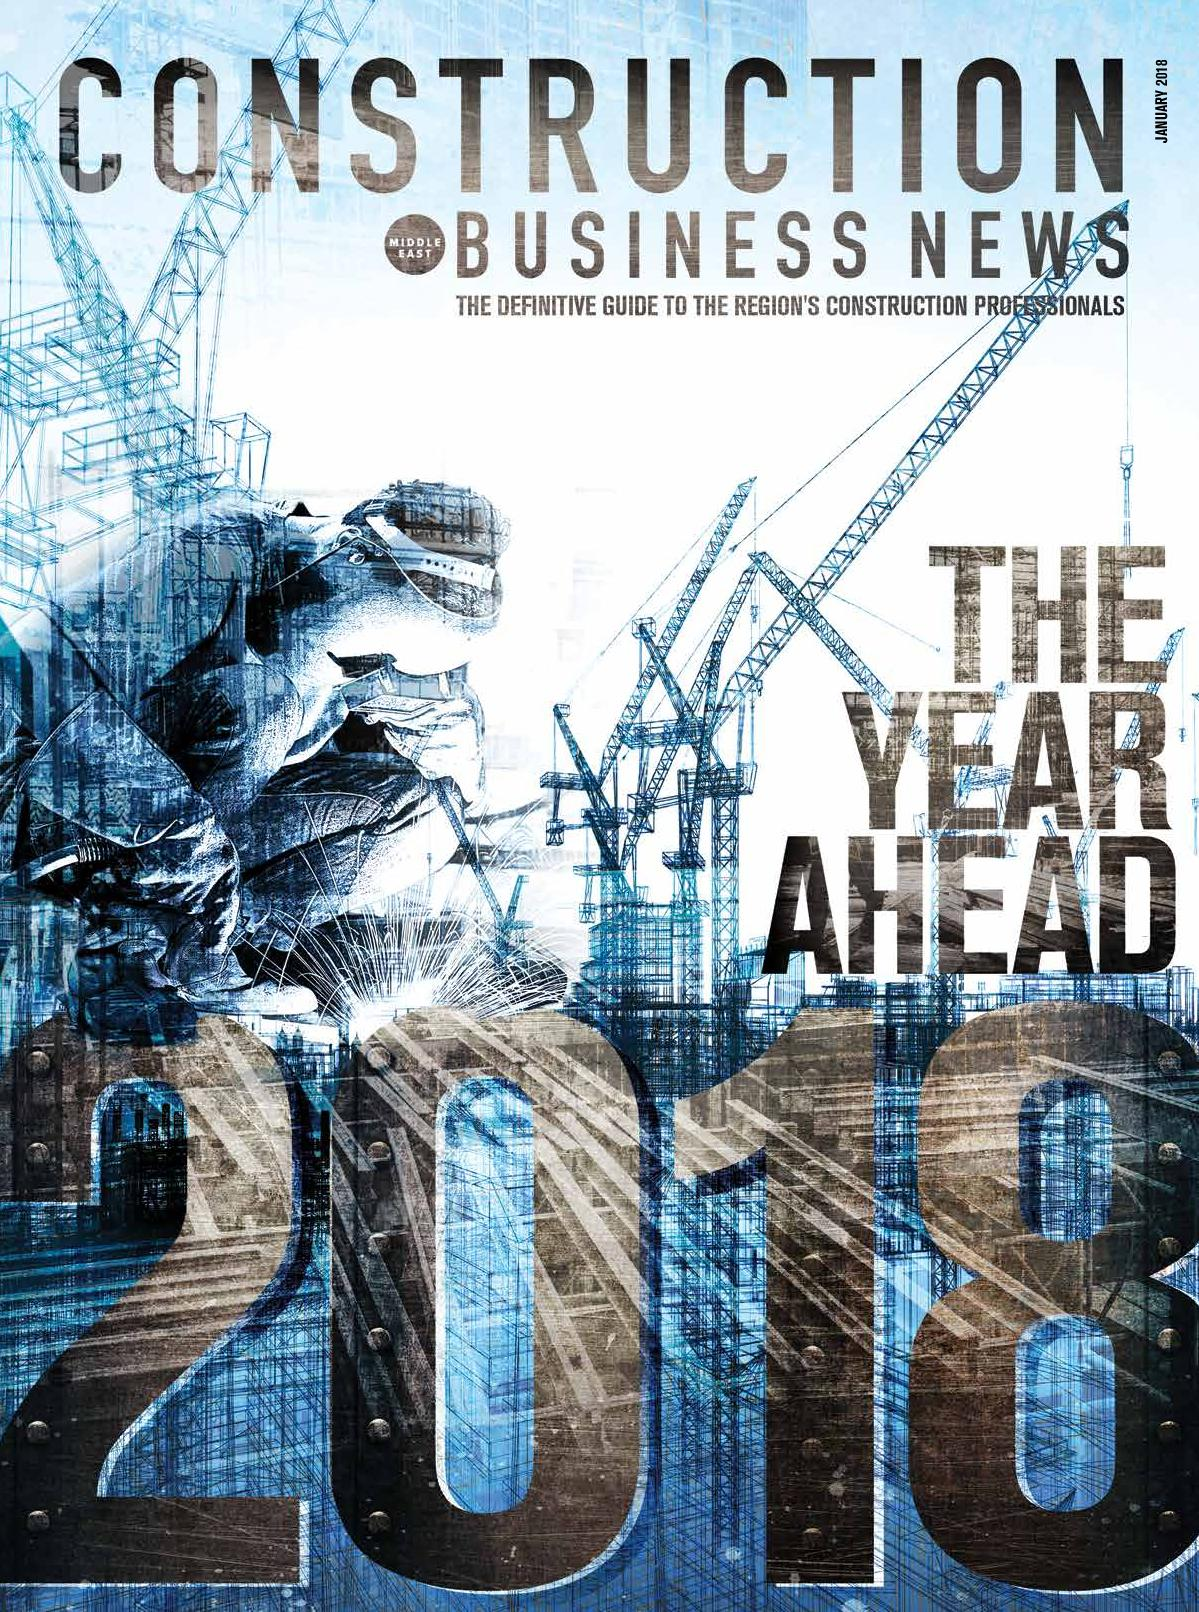 https://www.cbnme.com/magazines/construction-business-news-january-2018/